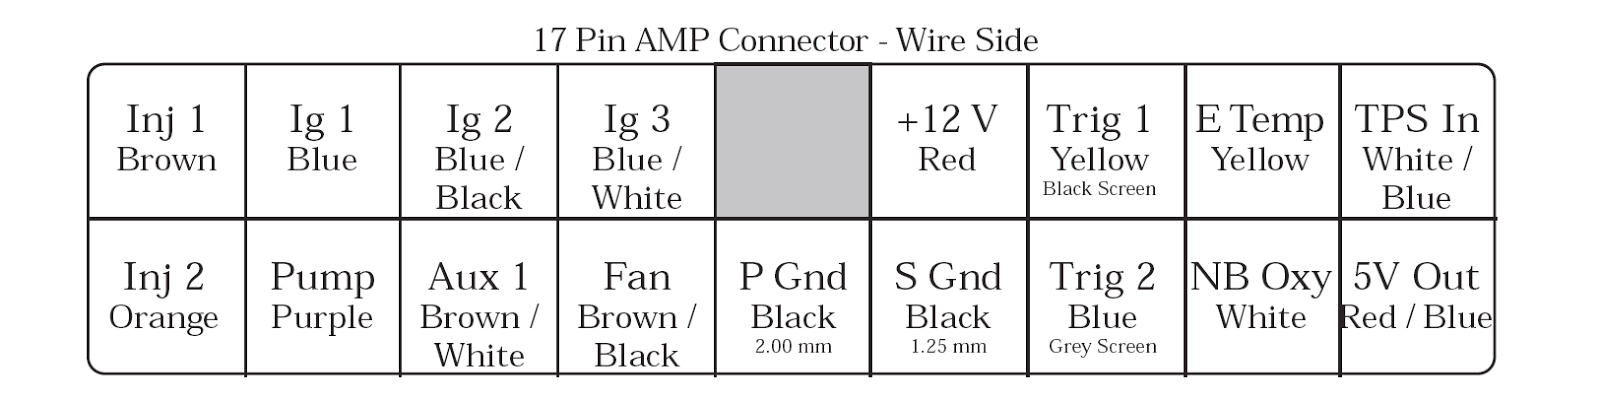 4age Blacktop Wiring Diagram 2005 Scion Xb Radio Ecu Link Great Installation Of 20v Distrubitor For G1 V5 Rh Forums Linkecu Com Motronic Corolla